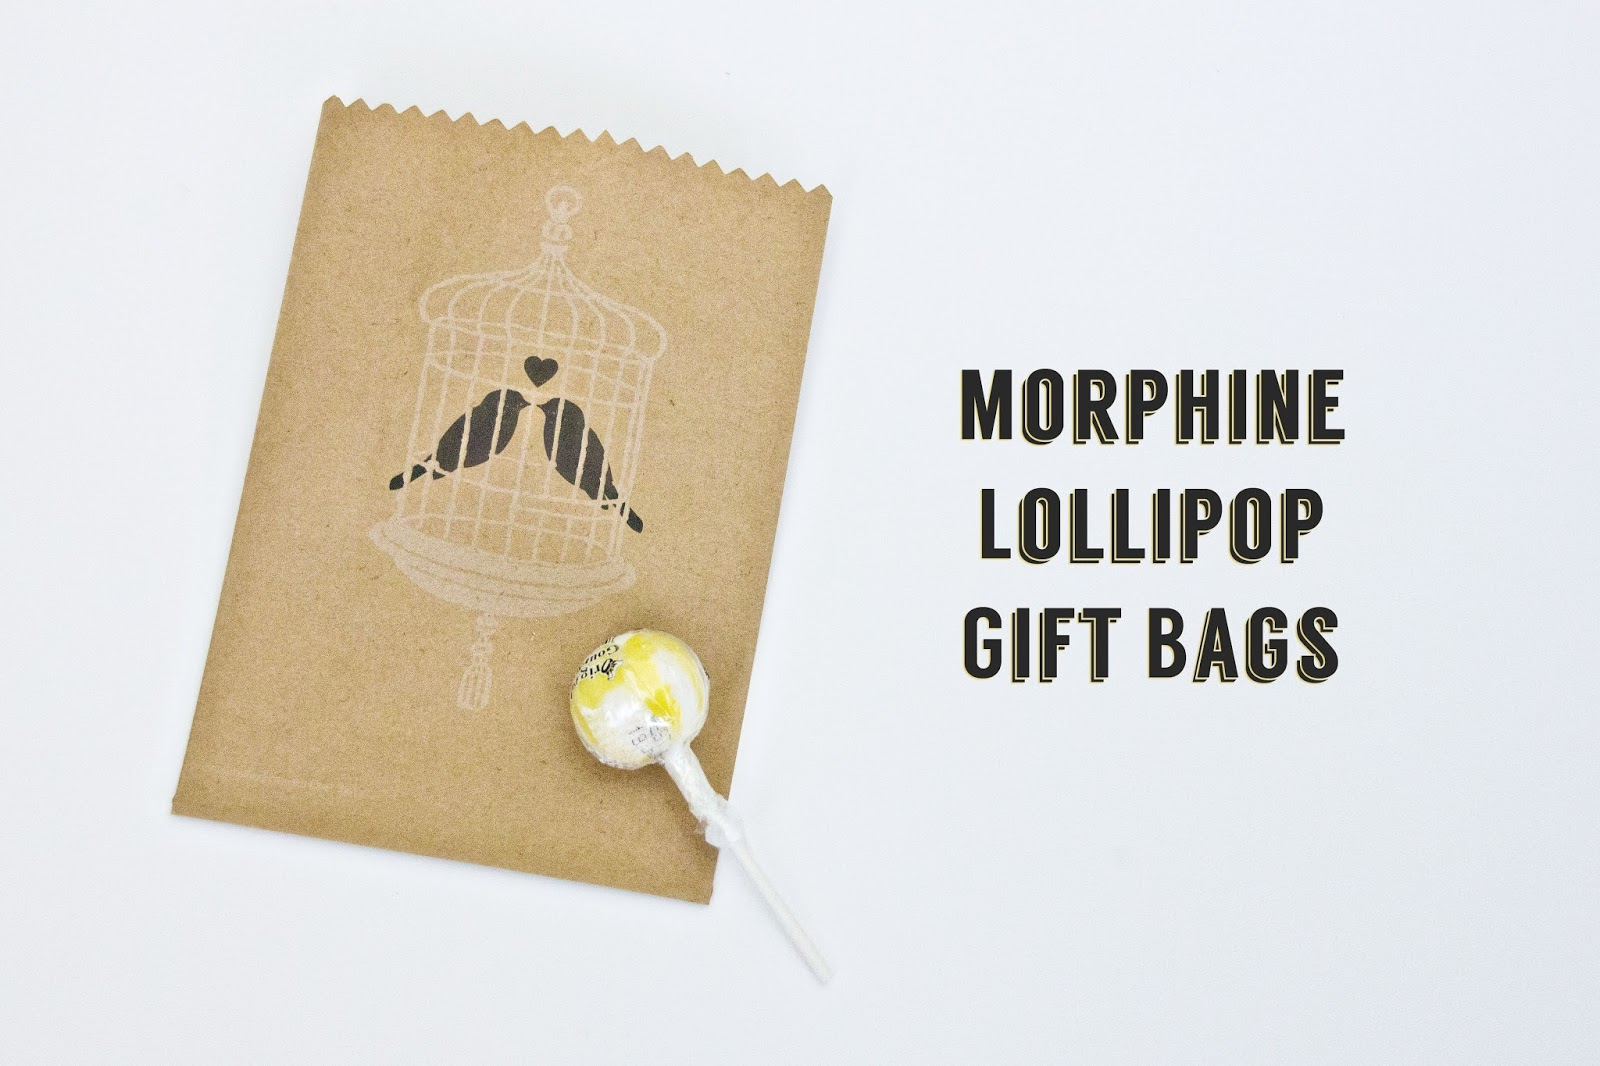 A Lollipop that isn't Candy – Navy Medicine